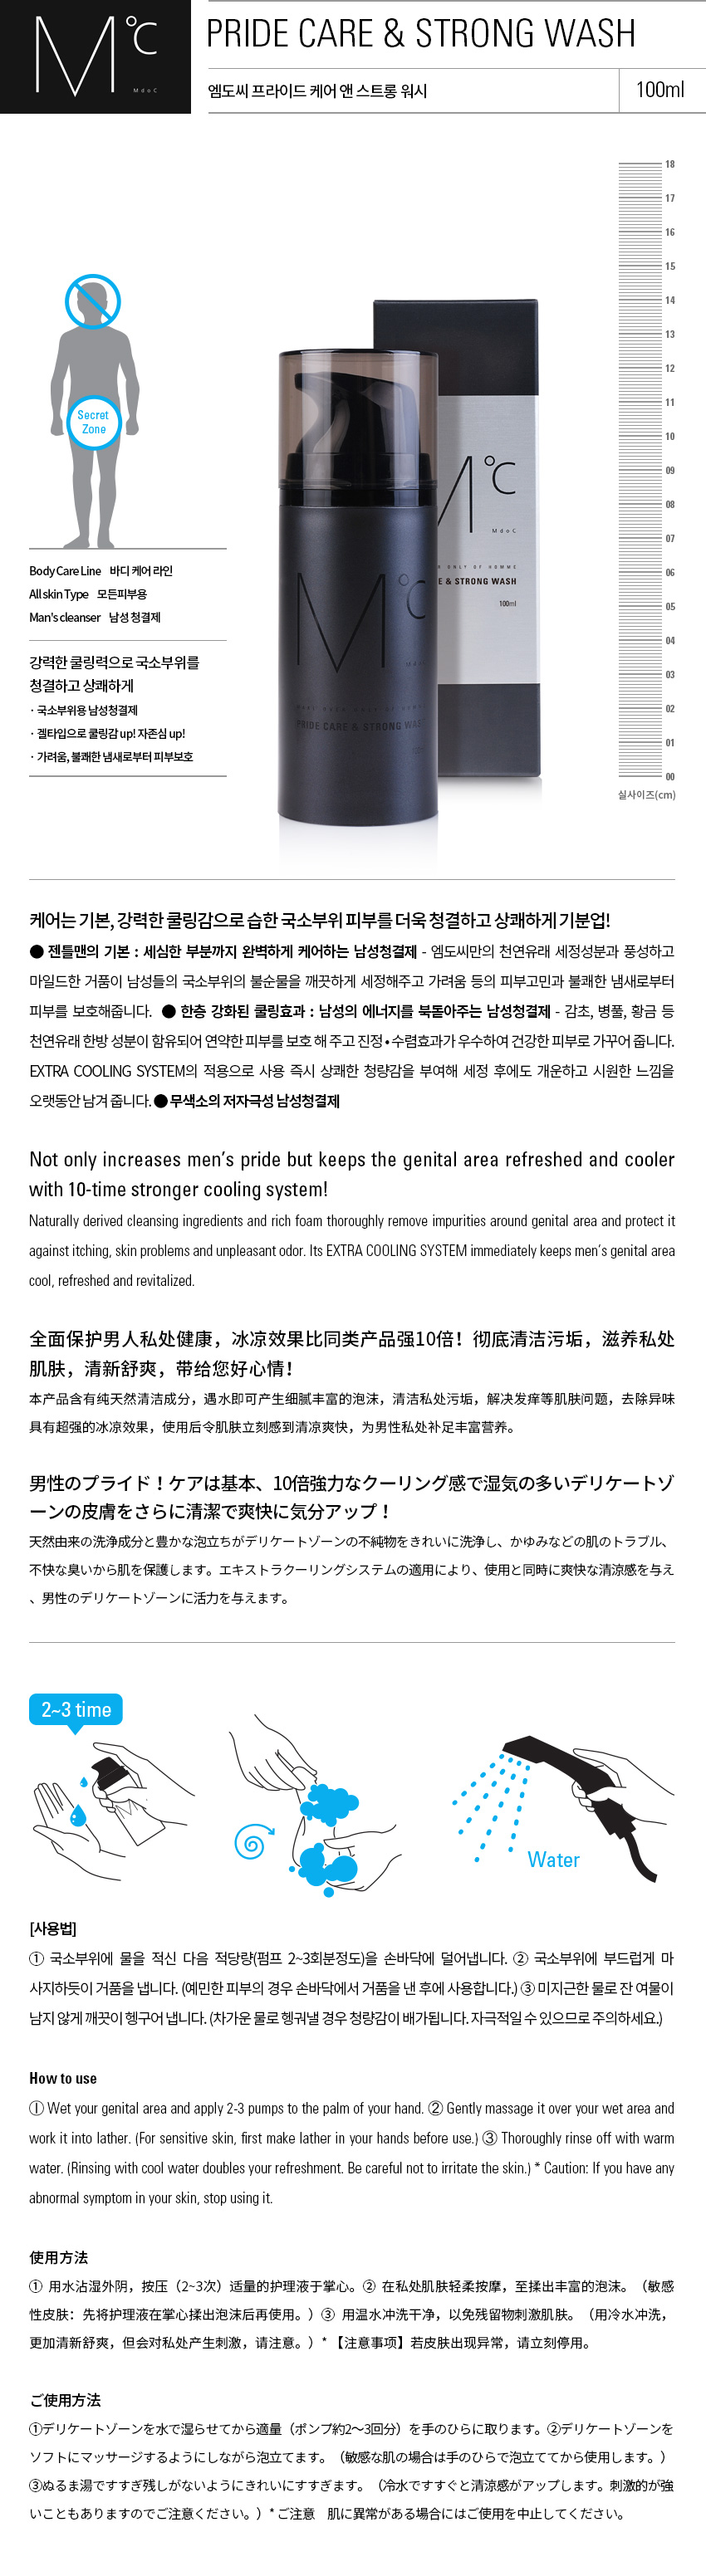 Pride Care & Strong Wash description 1